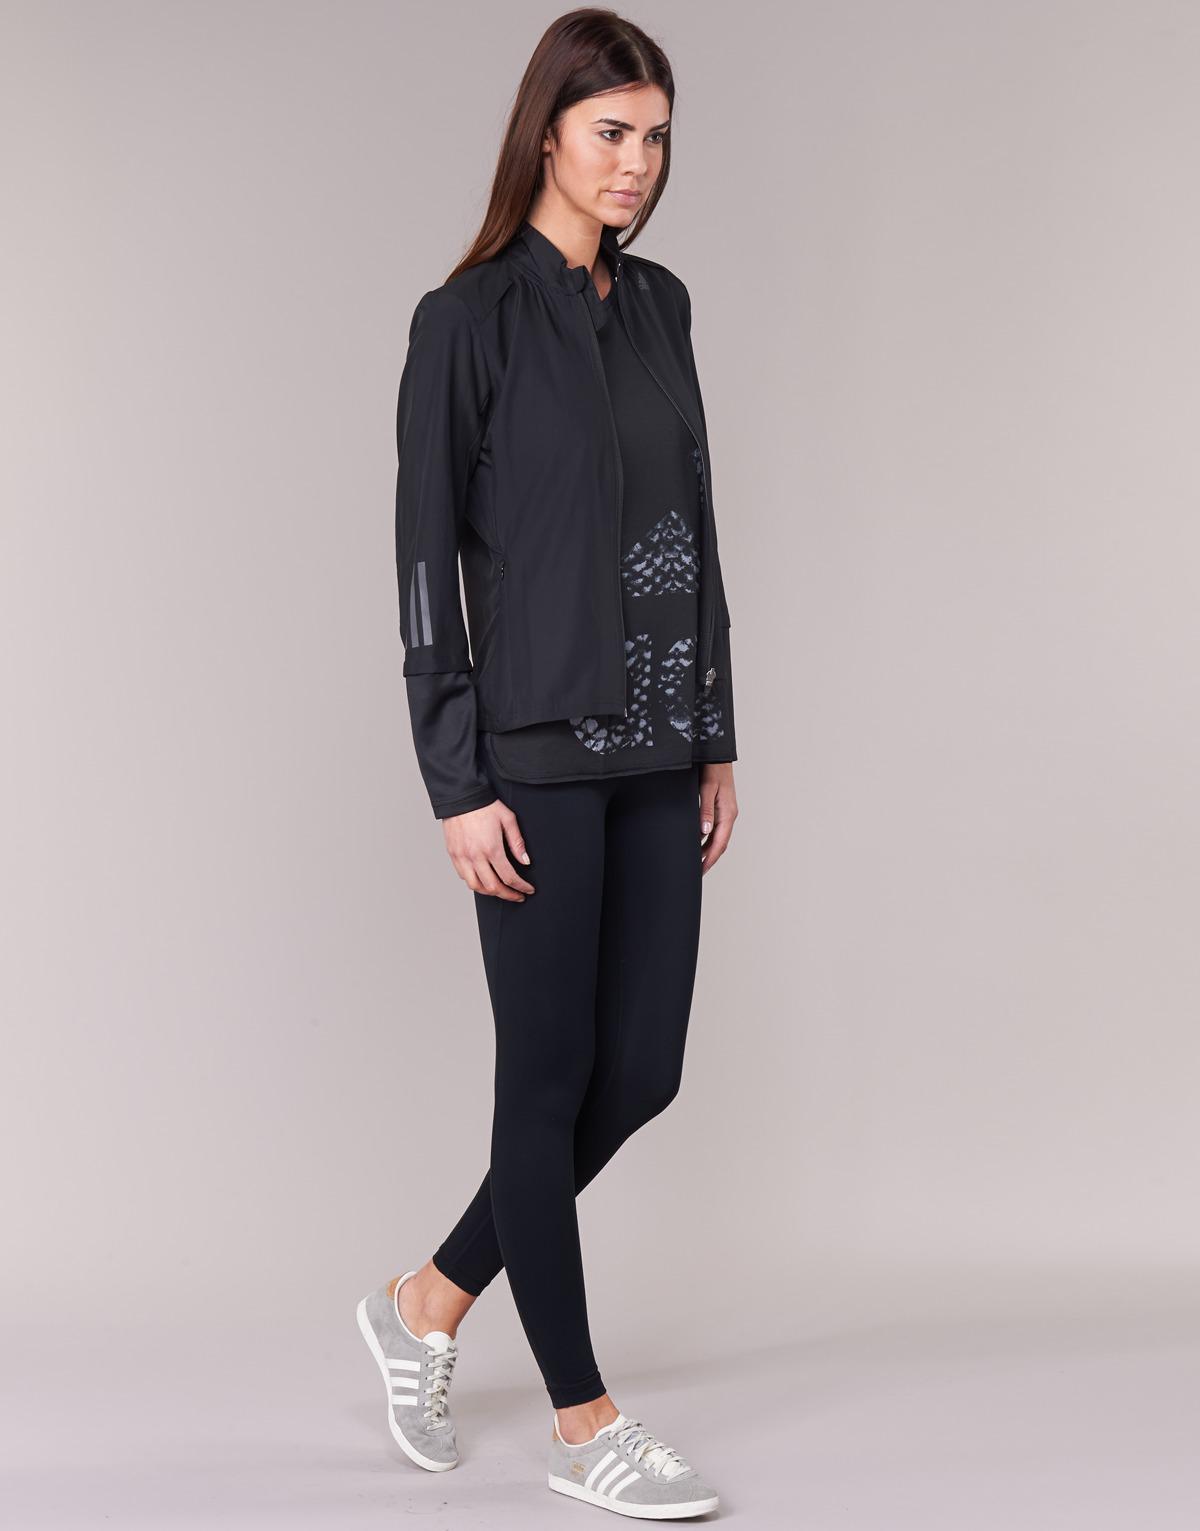 874d59c86532 Adidas - Rs Wind Jkt W Women s Tracksuit Jacket In Black - Lyst. View  fullscreen